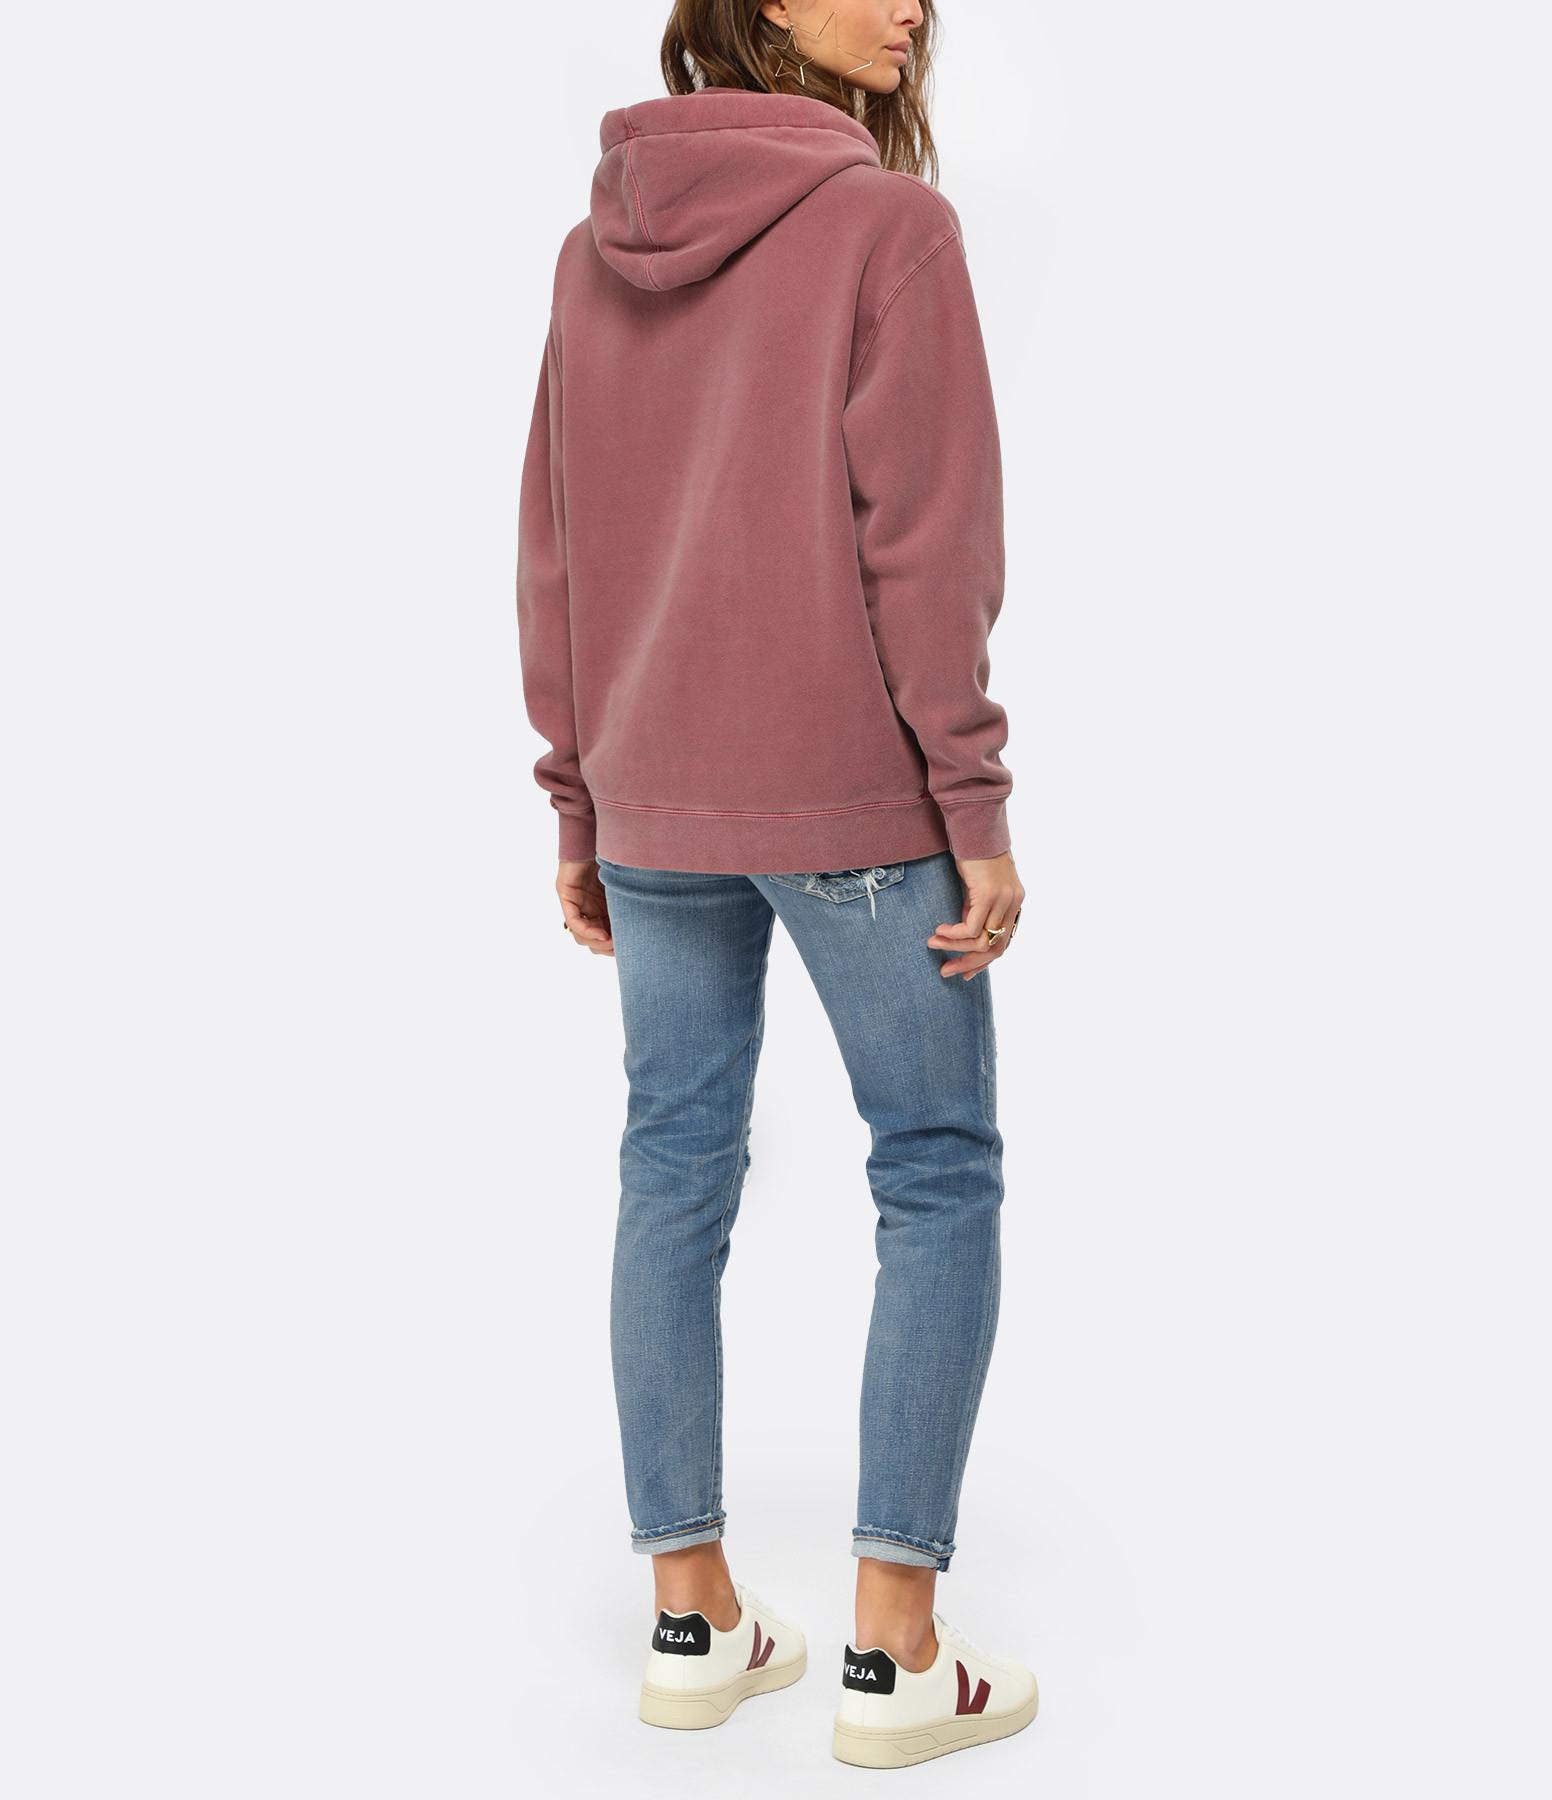 NEWTONE - Sweatshirt Hoody Phoenix Fit Jagger Coton Brique